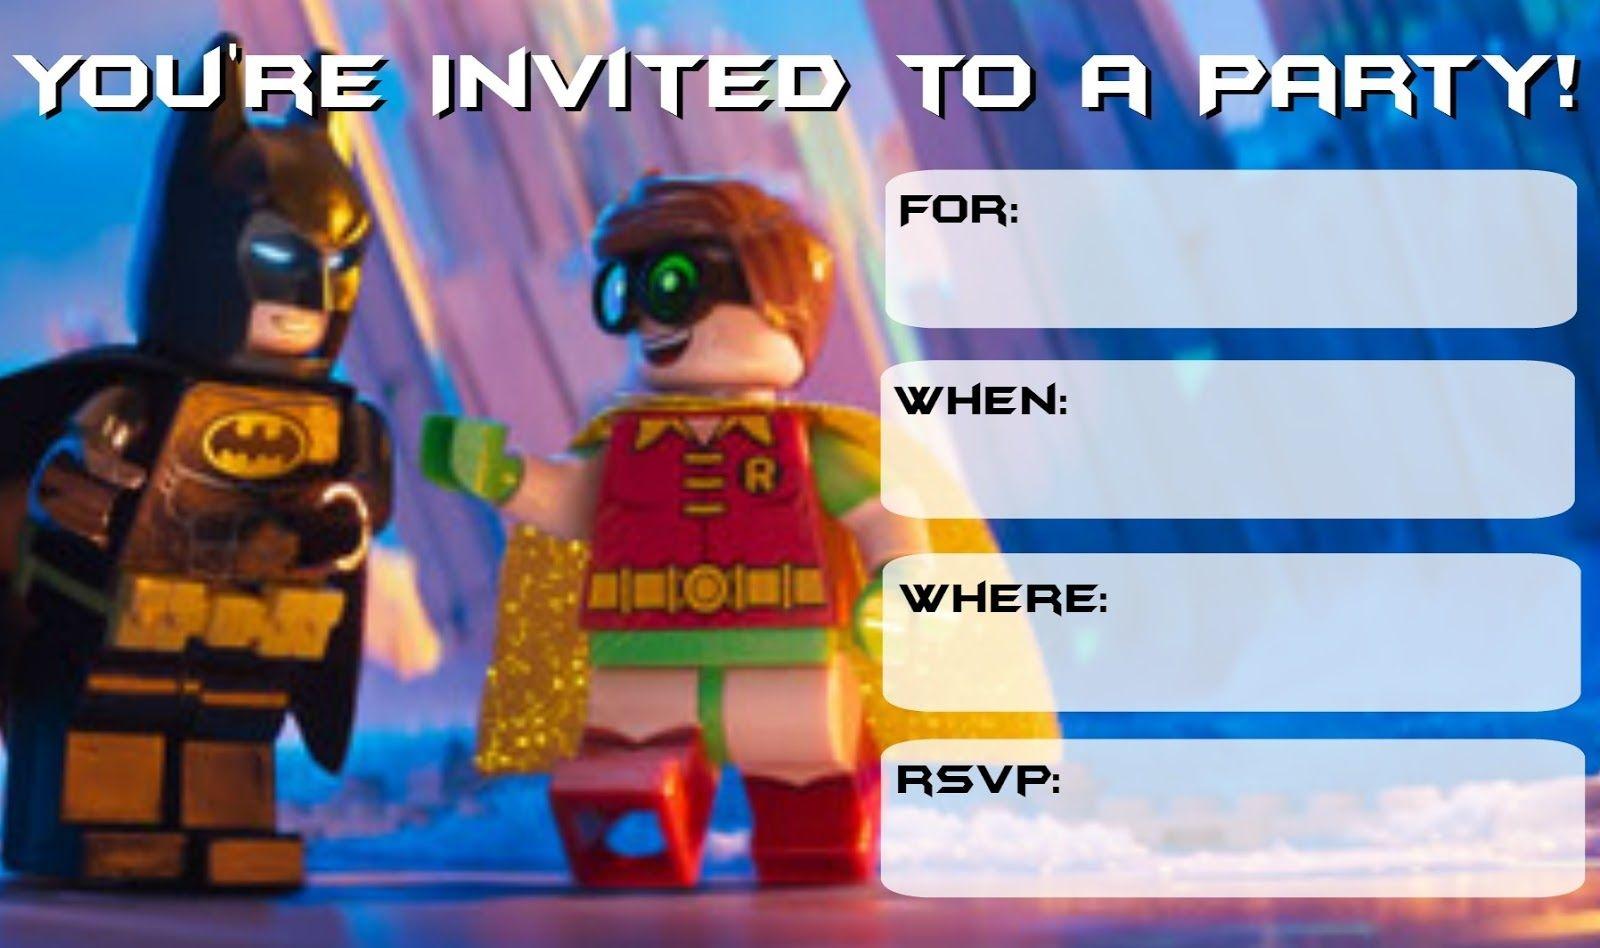 More Lego Batman Party Invitations   Drew's Birthday   Lego Batman - Lego Batman Party Invitations Free Printable